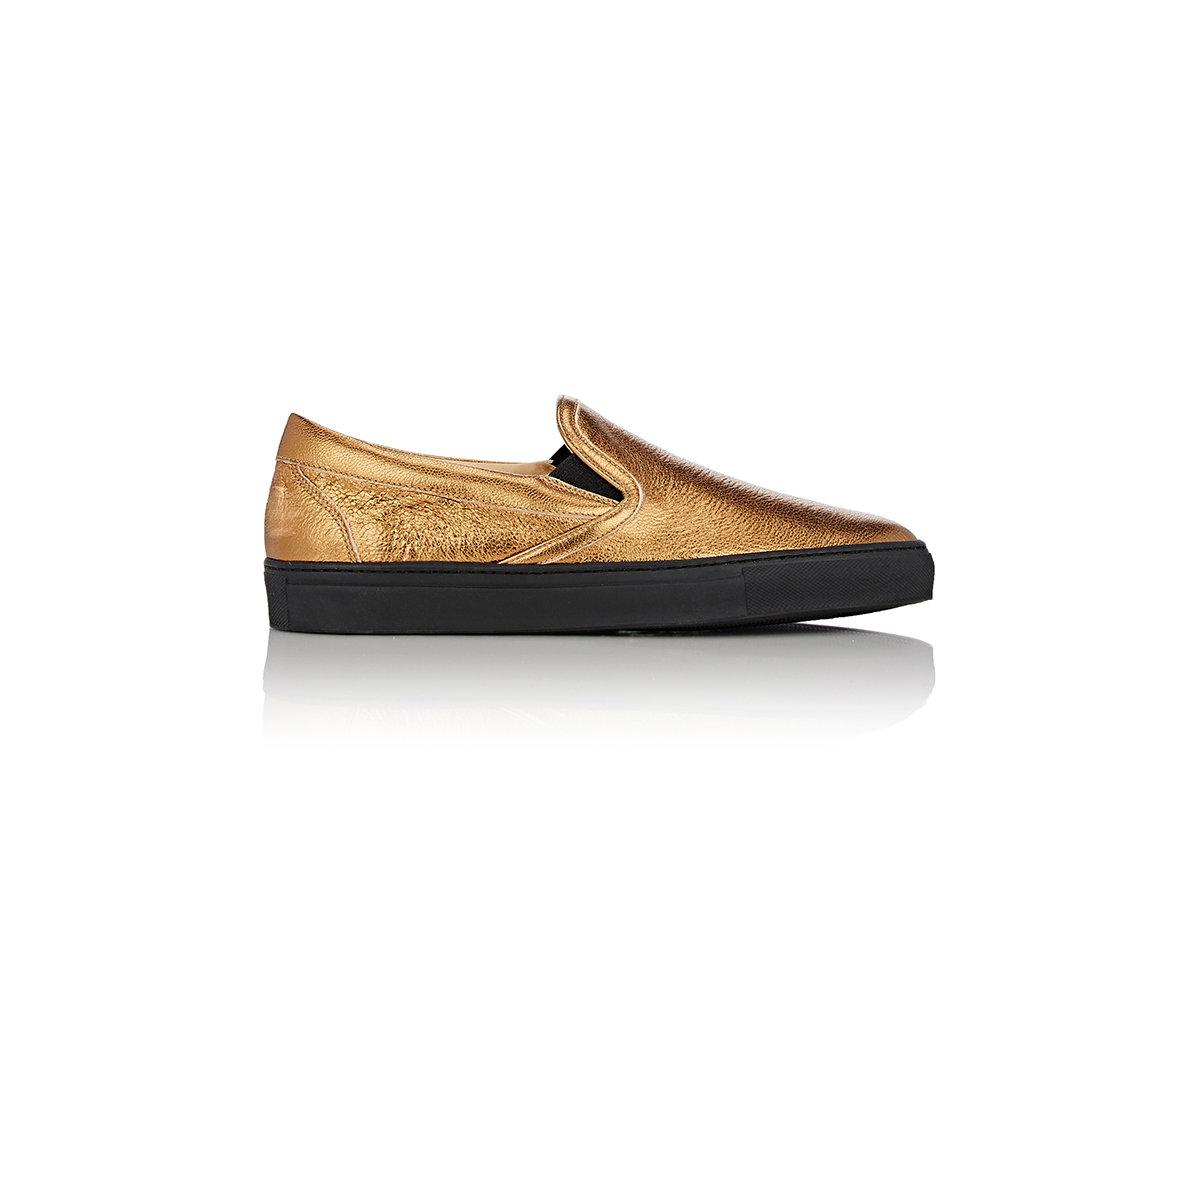 mens christian louboutin sneakers barneys - Bavilon Salon